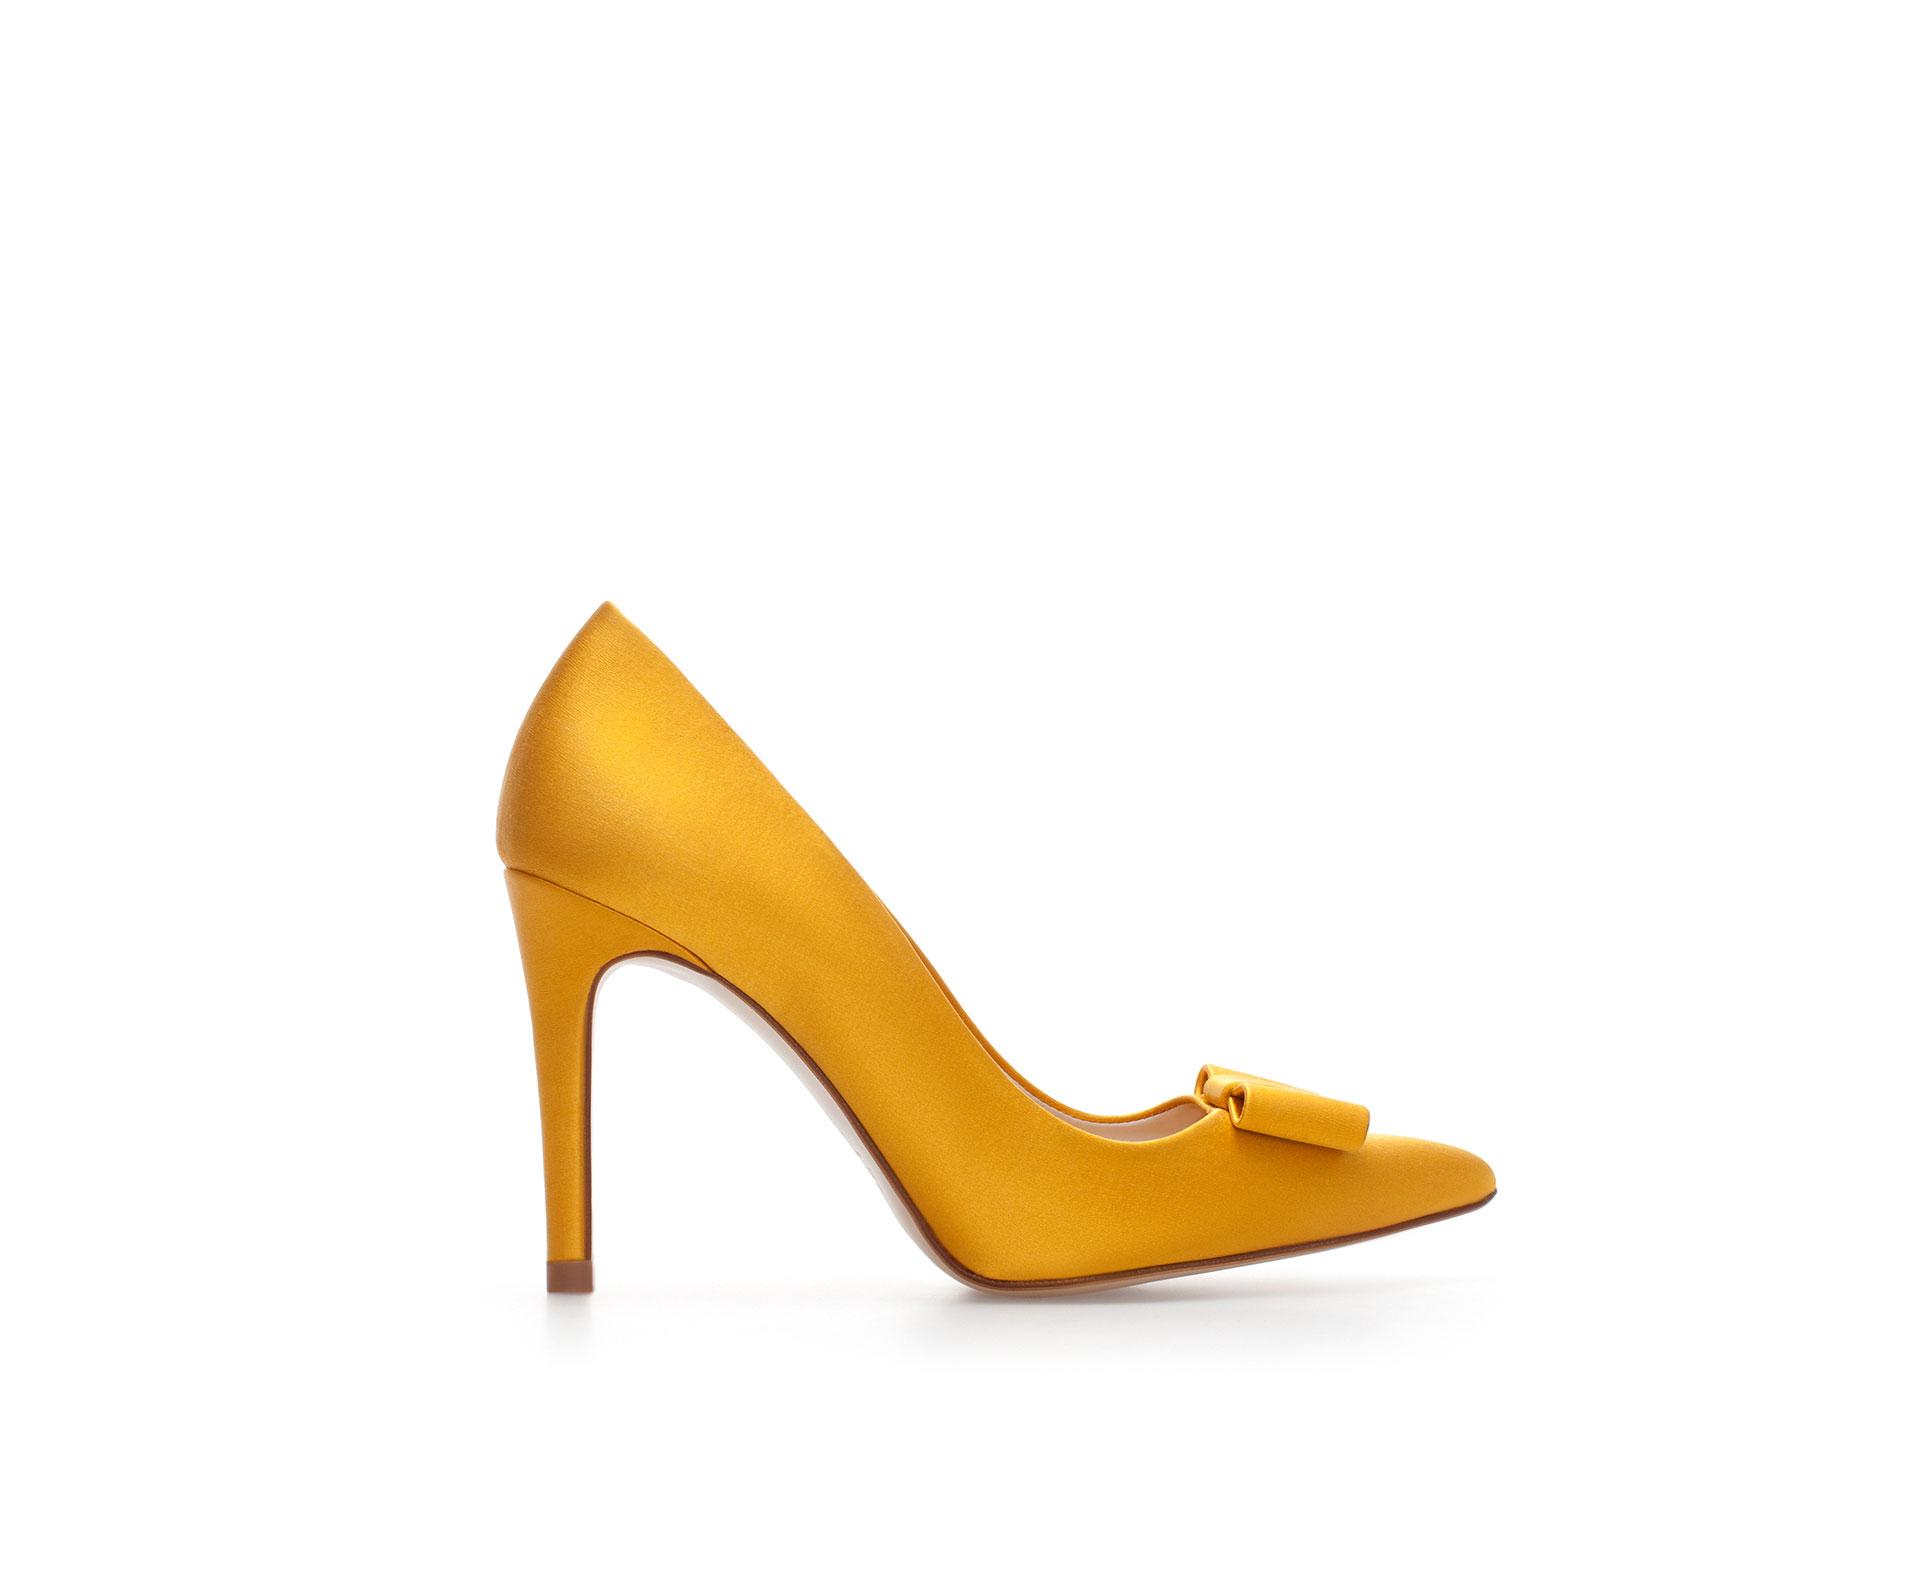 cd5e50e7ada Zara Silk Satin High Heel Court Shoe in Yellow (Mustard)